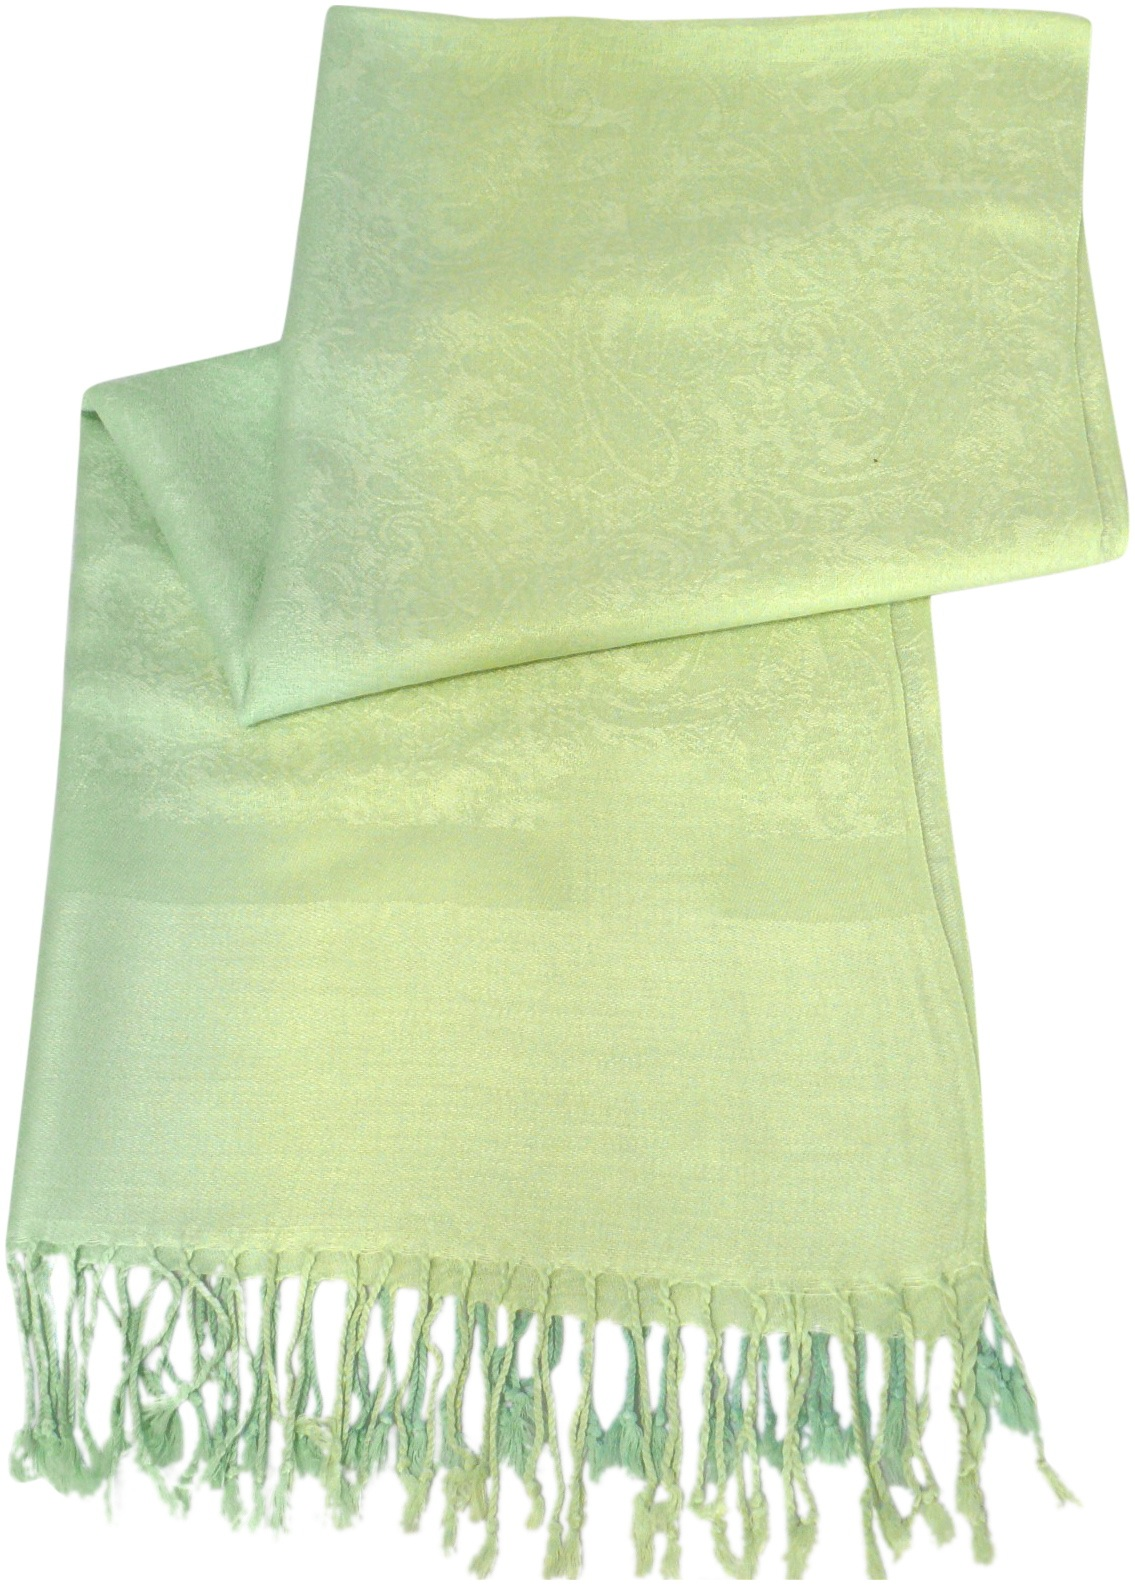 Green Two Tone Design Pashmina Shawl Scarf Wrap Pashminas Shawls NEW a3040-504